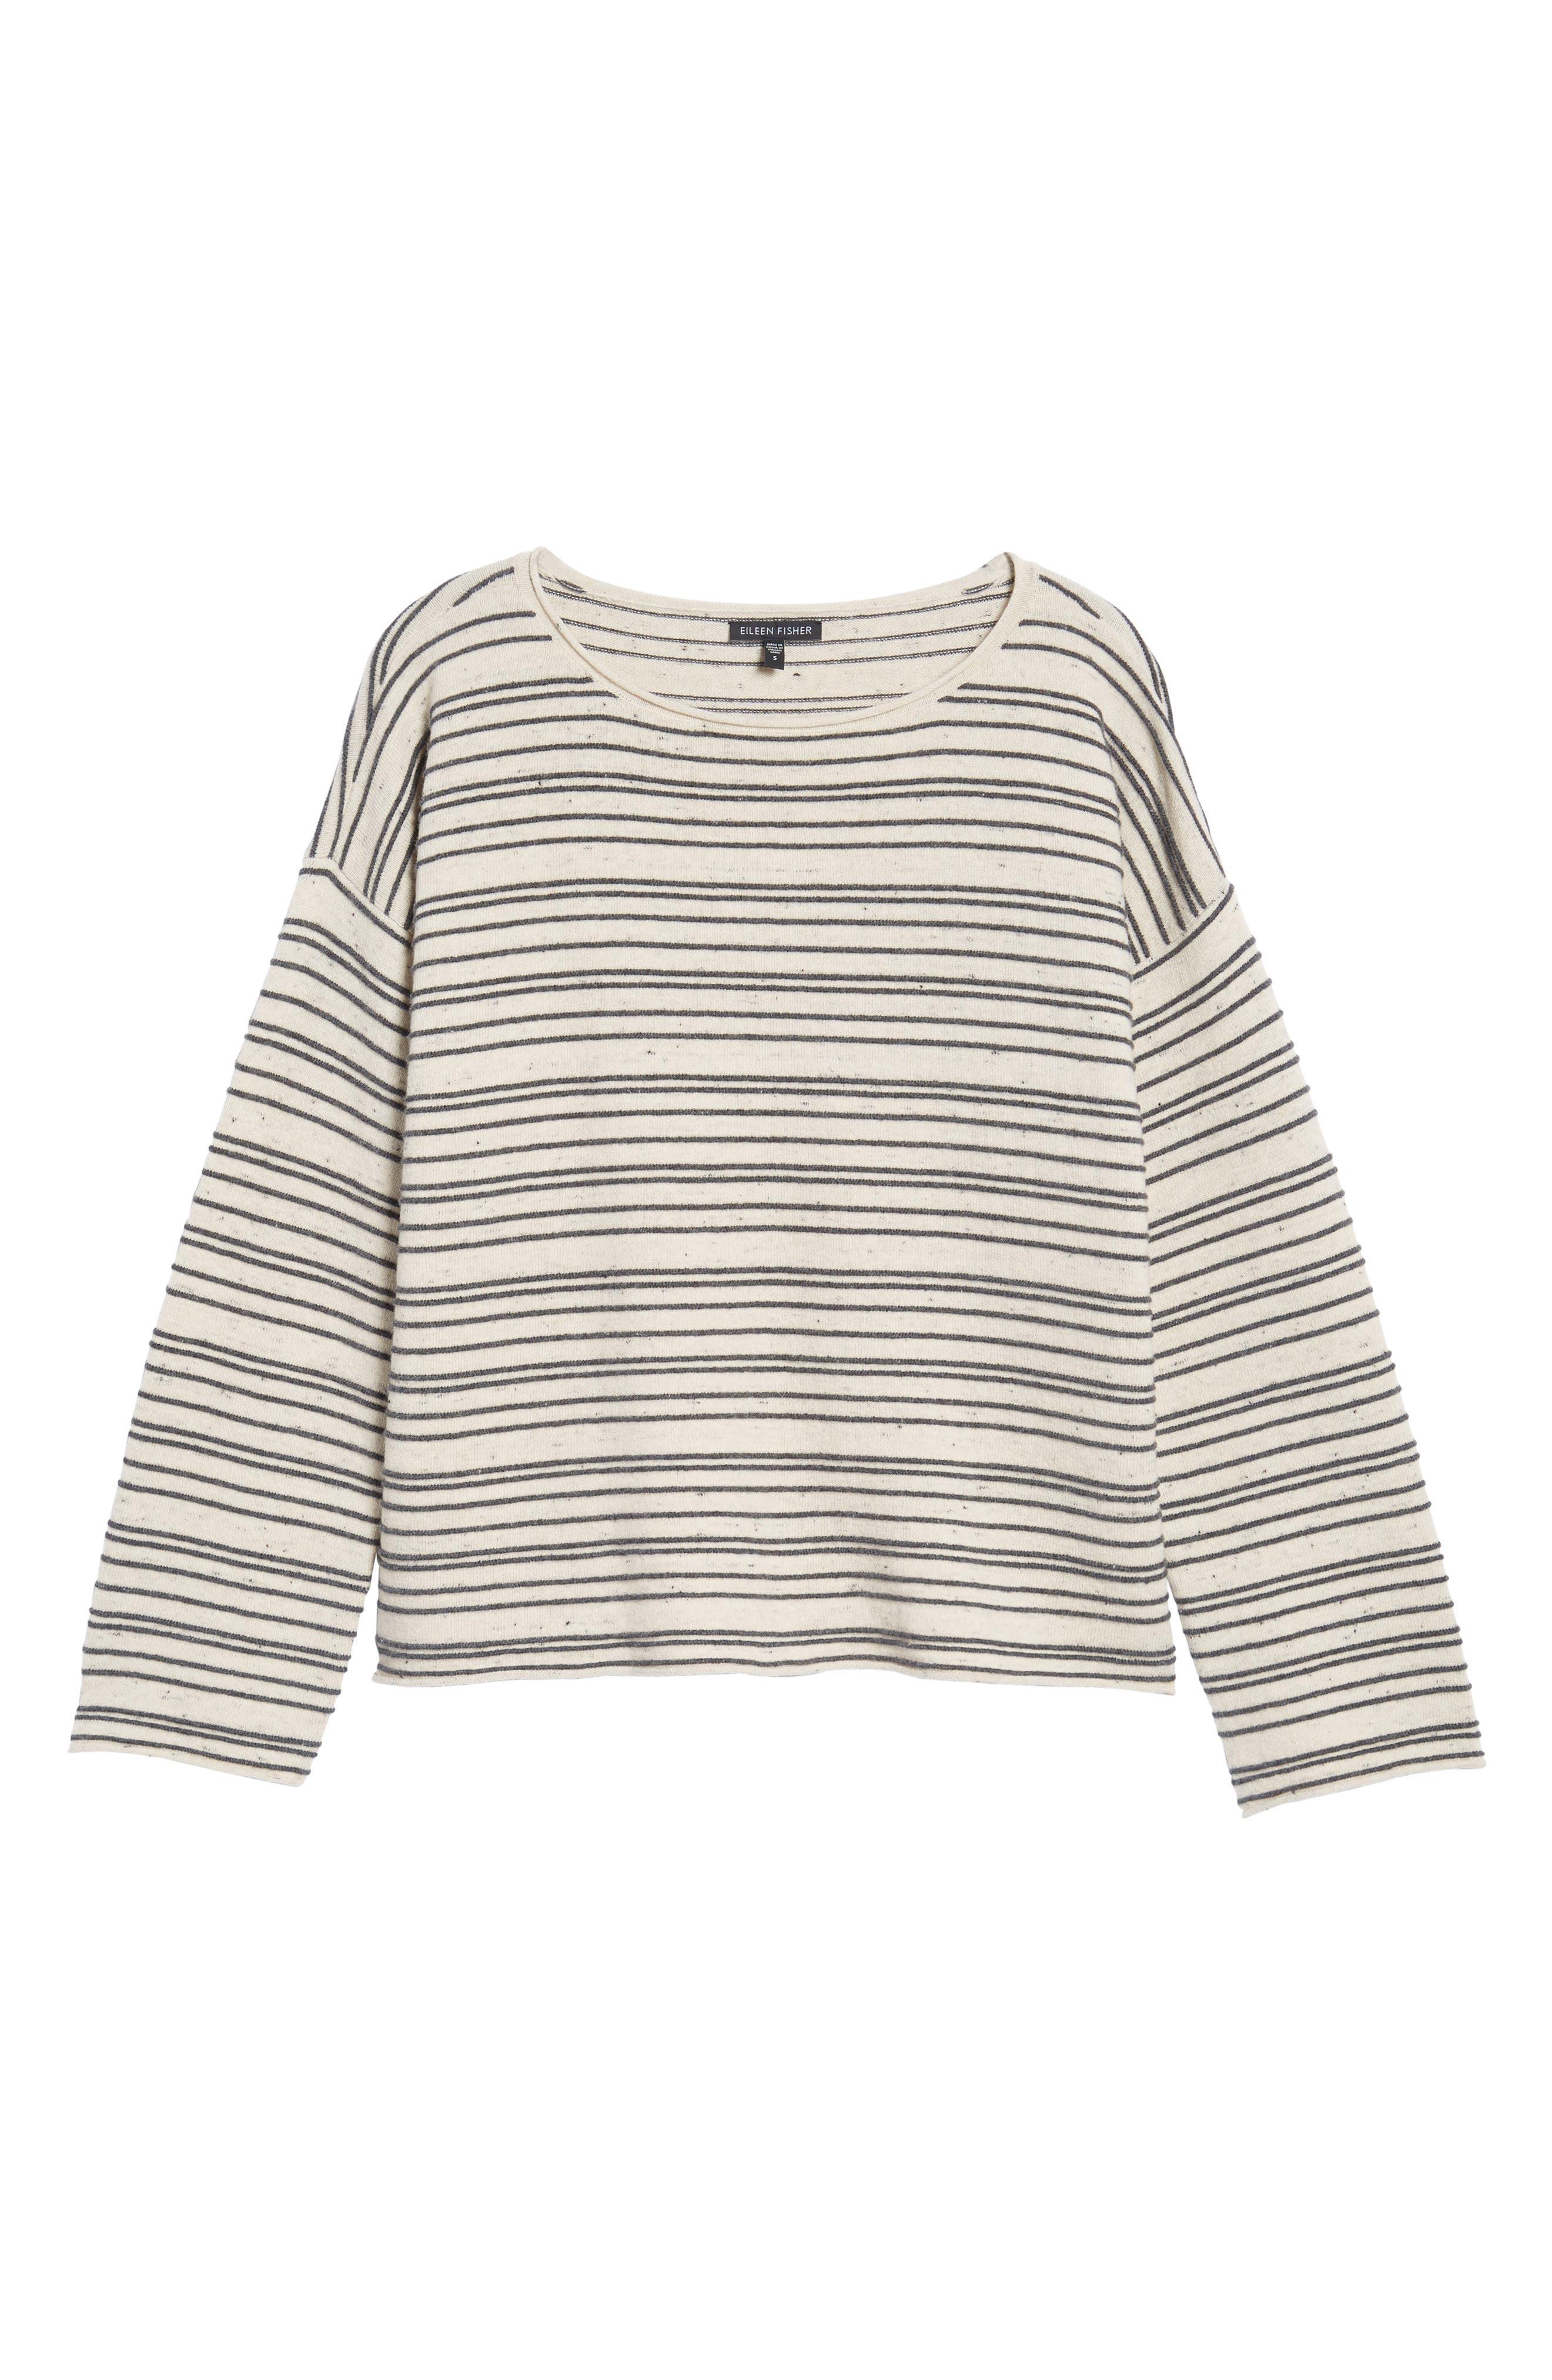 Stripe Organic Cotton Blend Sweater,                             Alternate thumbnail 6, color,                             264